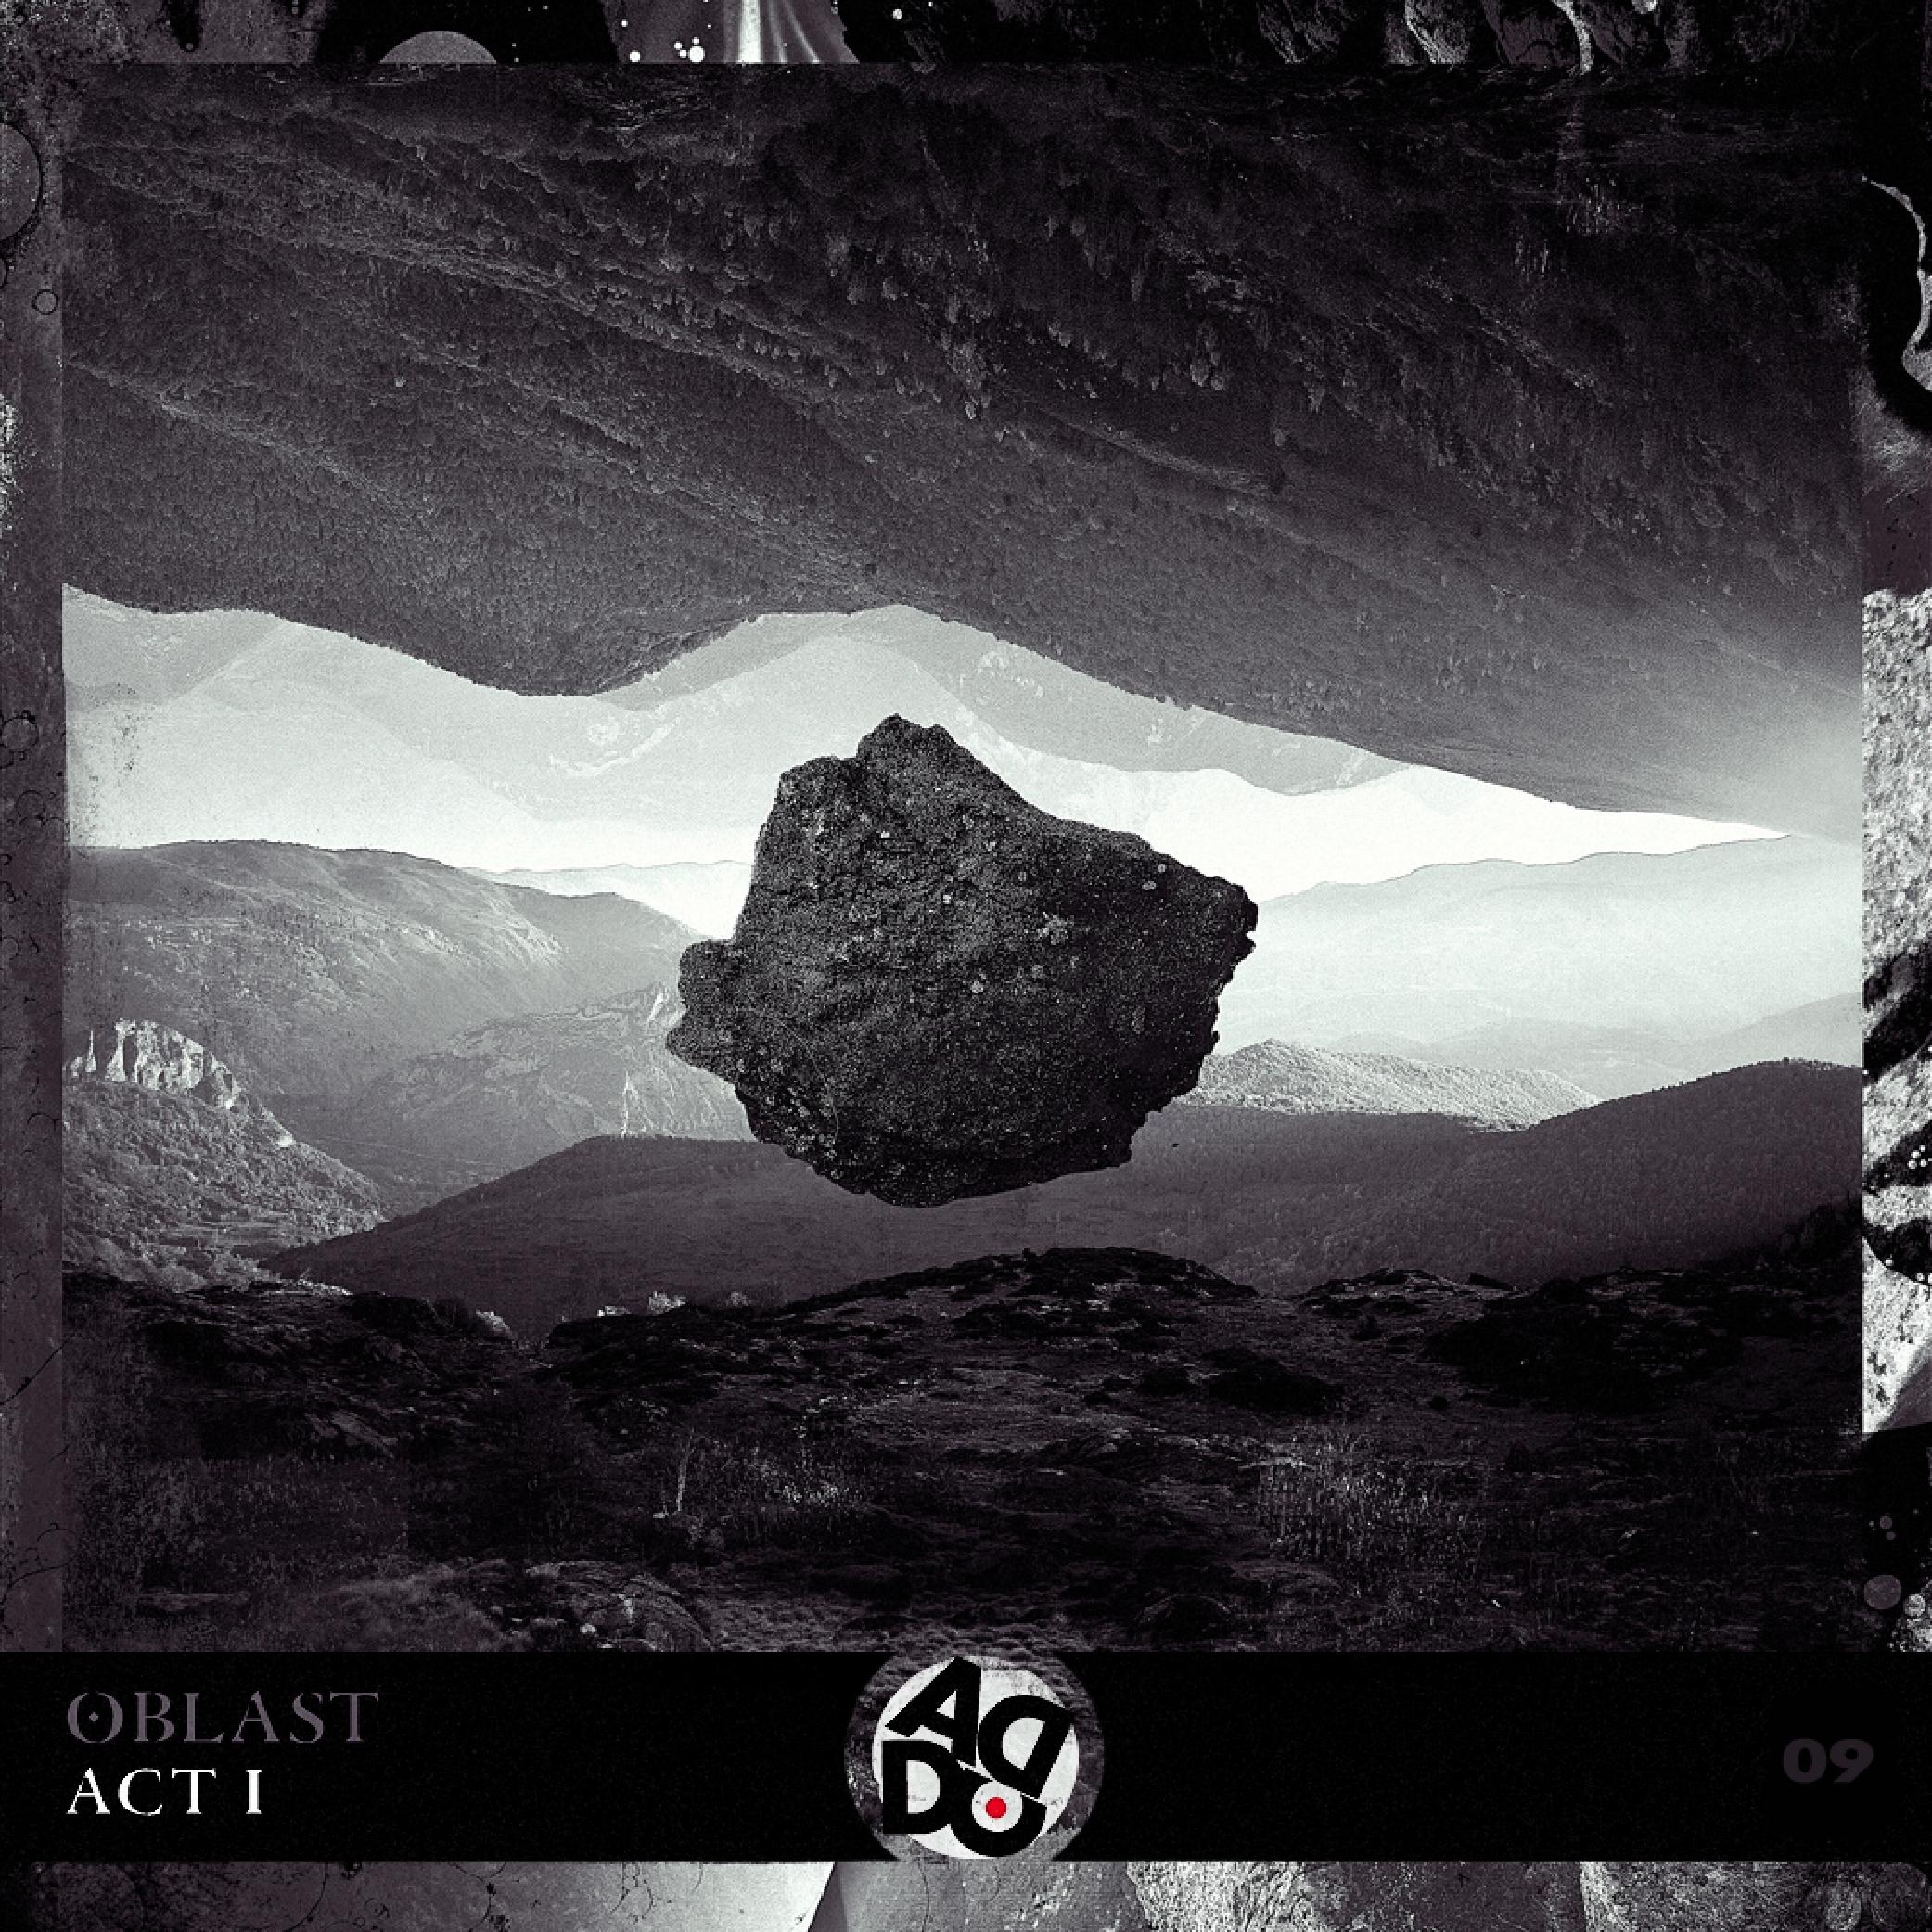 Oblast - Acte 1